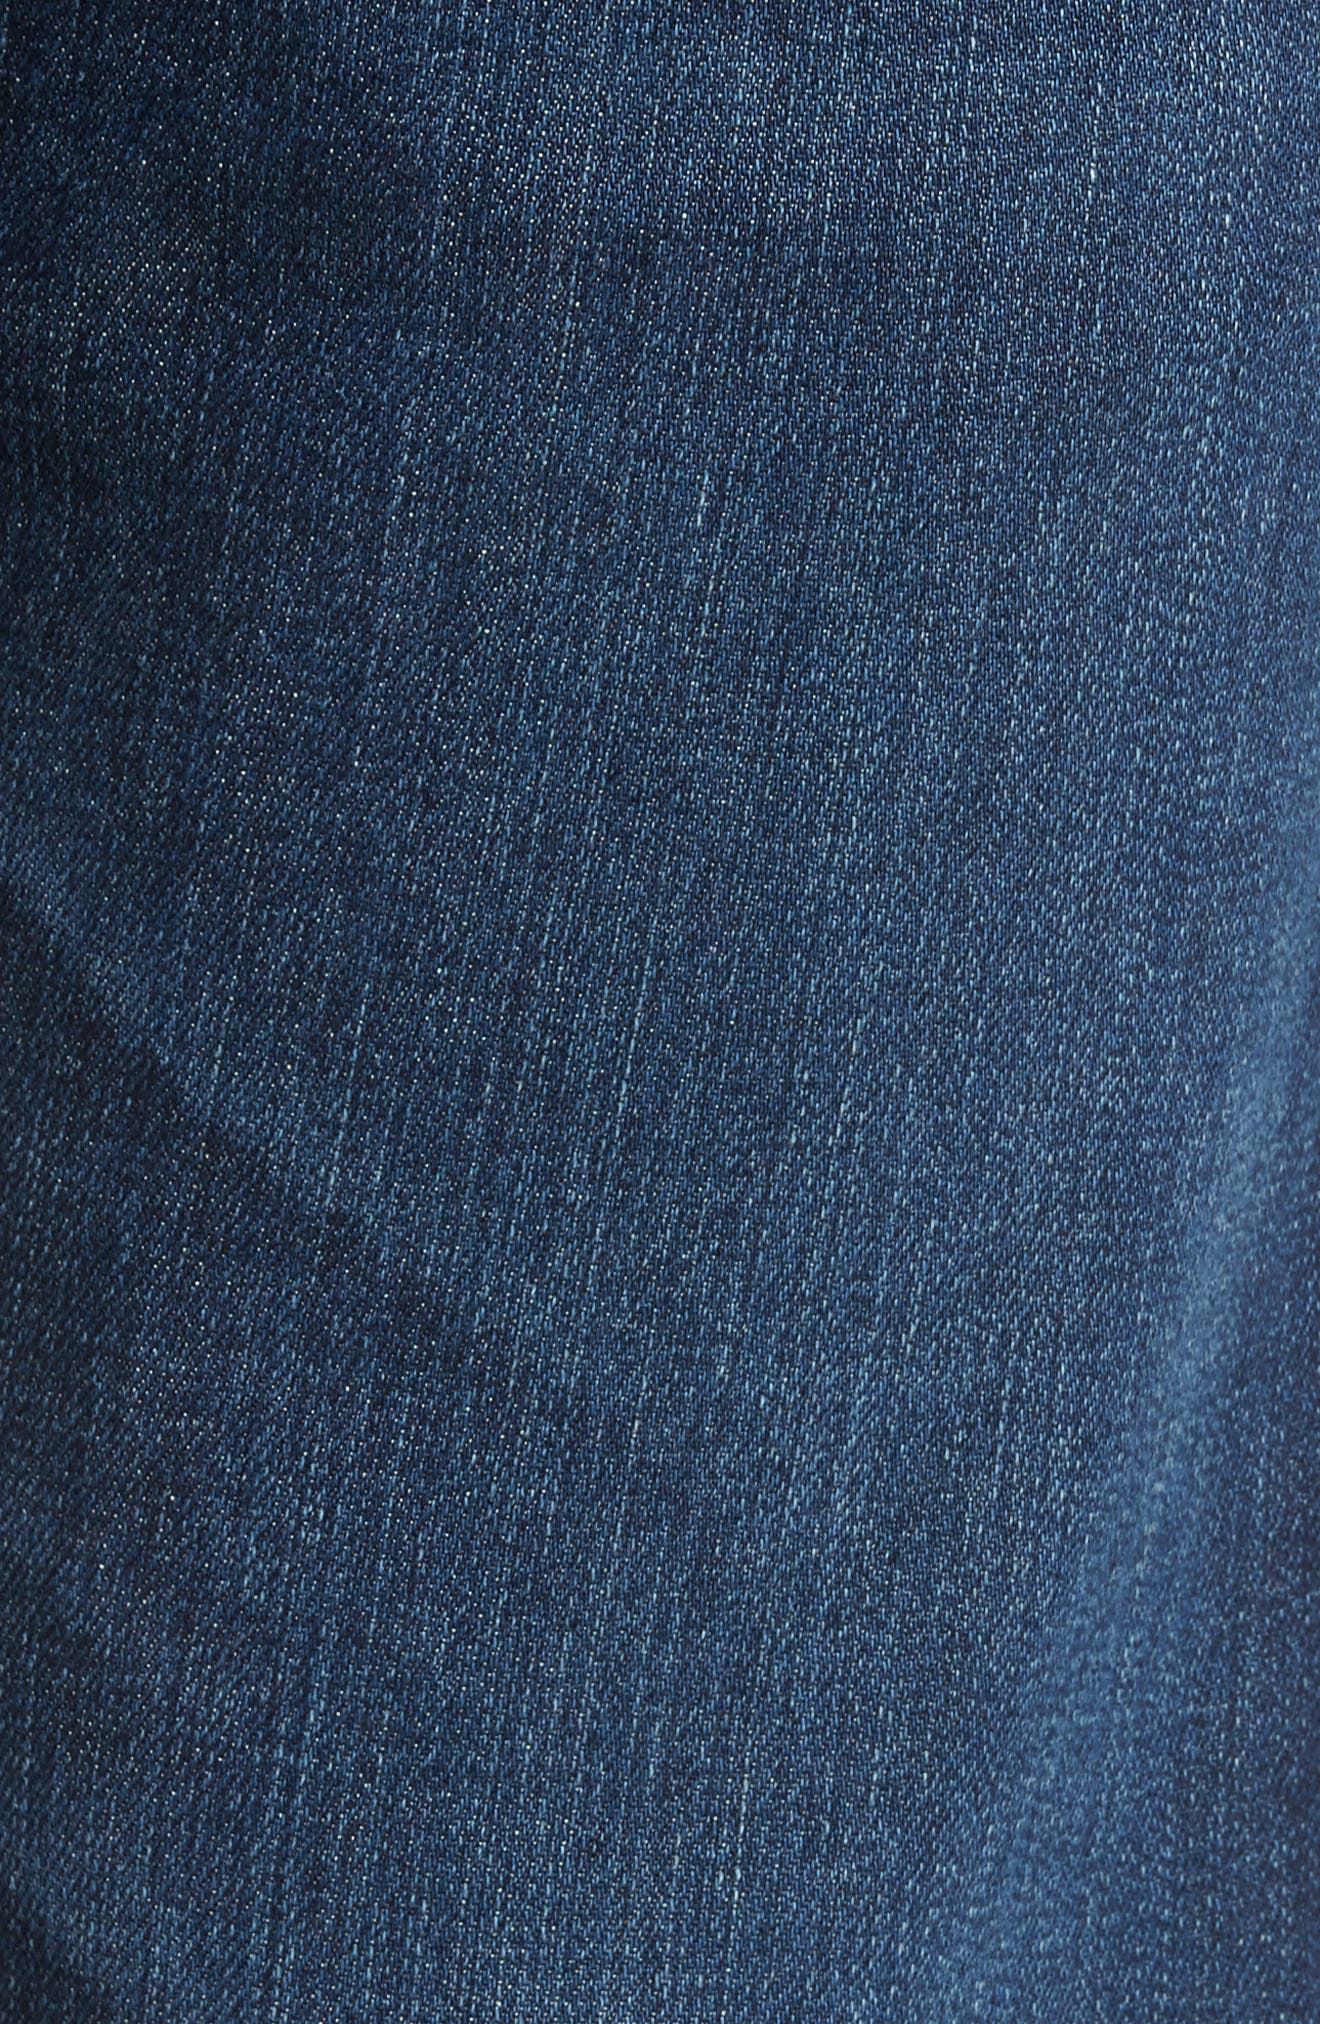 Ives Straight Leg Jeans,                             Alternate thumbnail 5, color,                             438